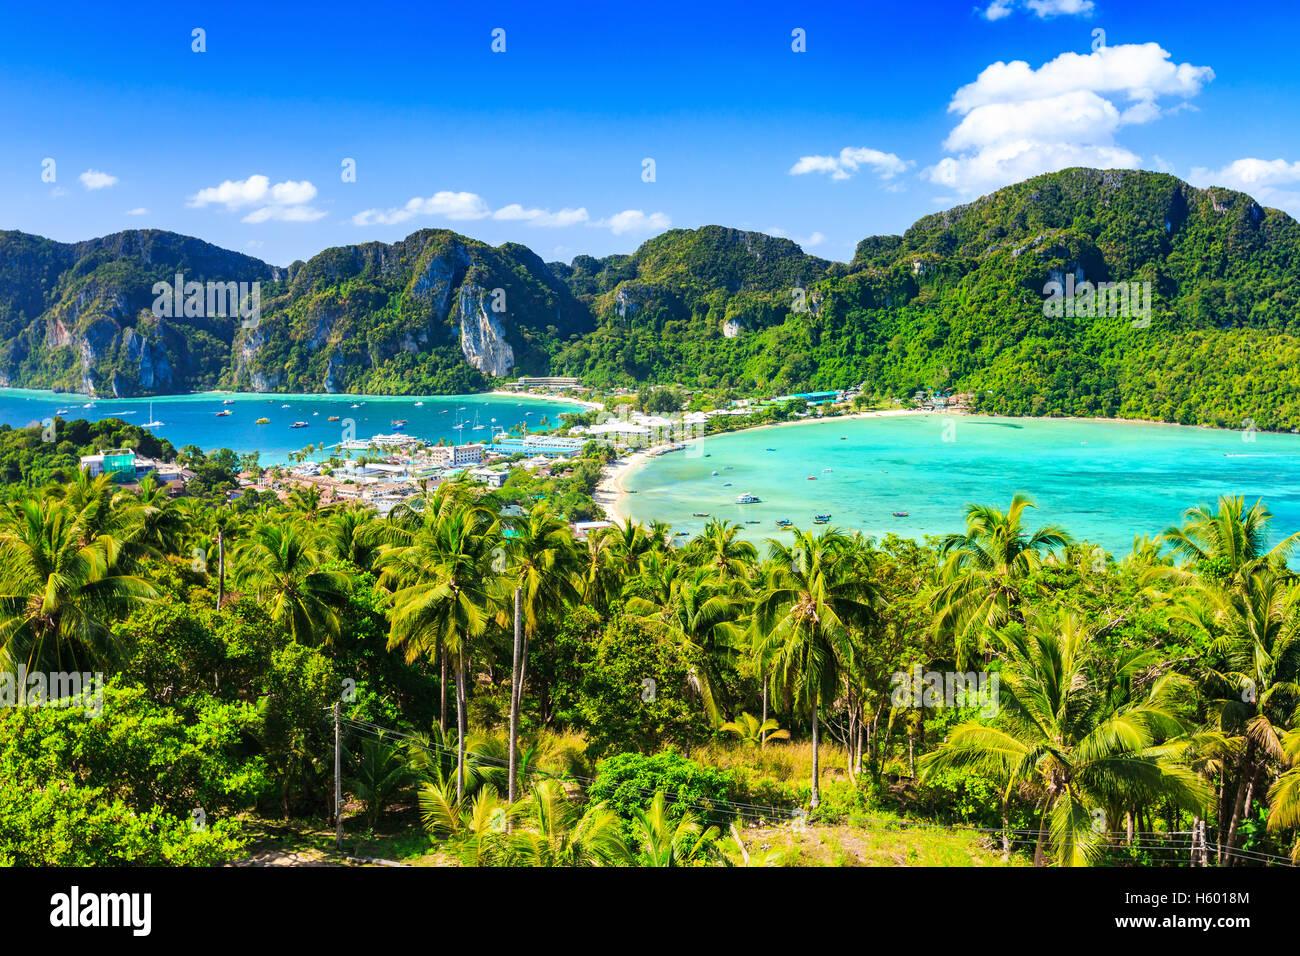 Thailand, Phi Phi Don island, Krabi province. - Stock Image